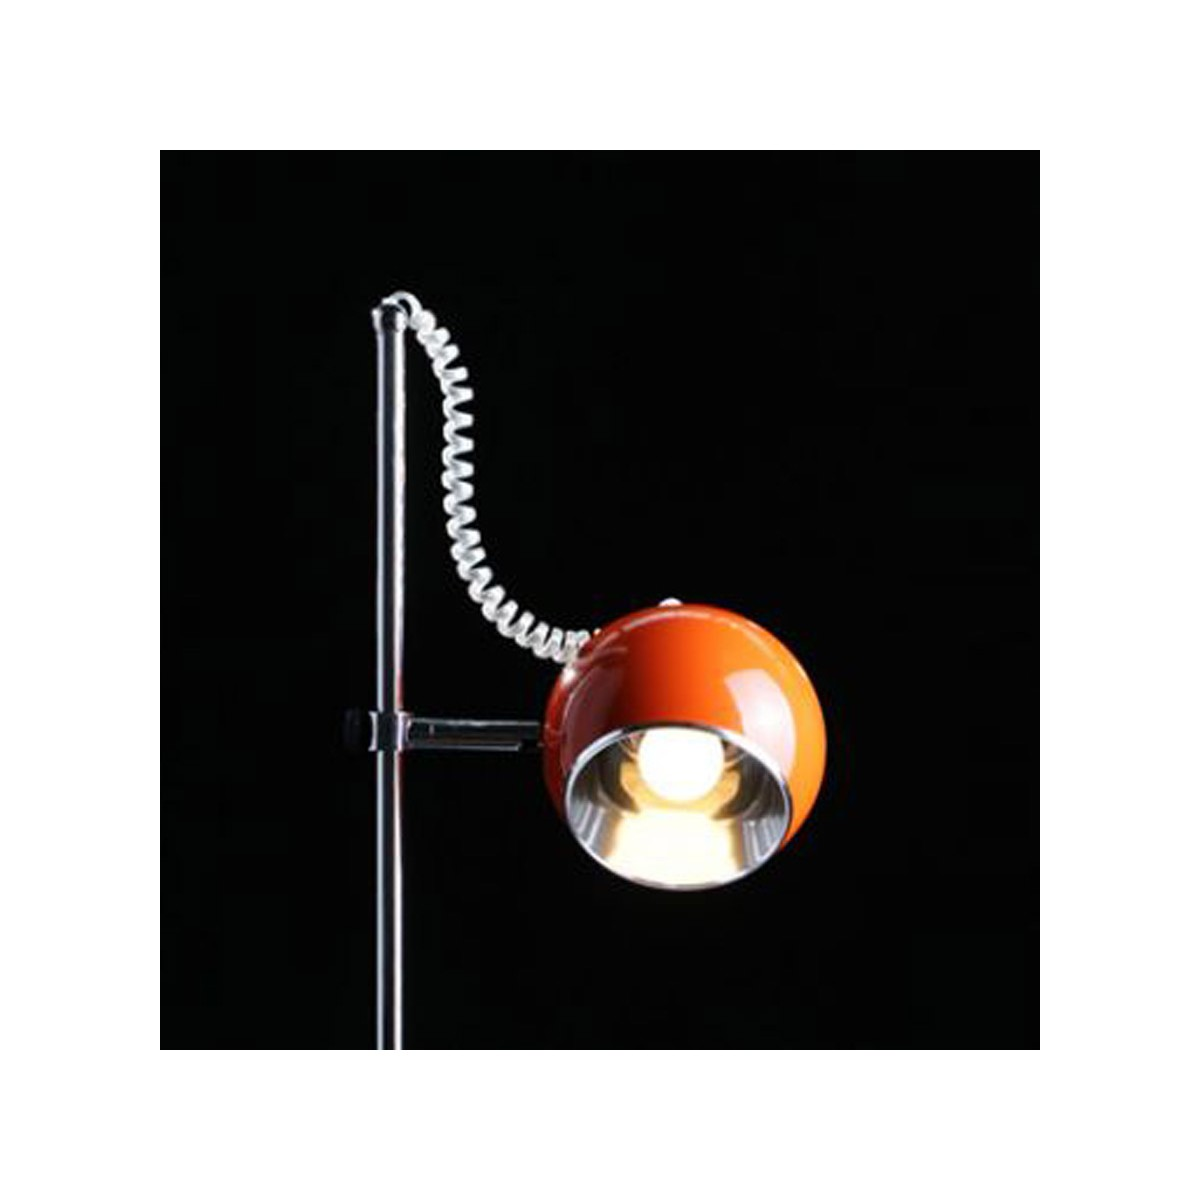 lampe de table design batara en m tal orange fran ais french. Black Bedroom Furniture Sets. Home Design Ideas